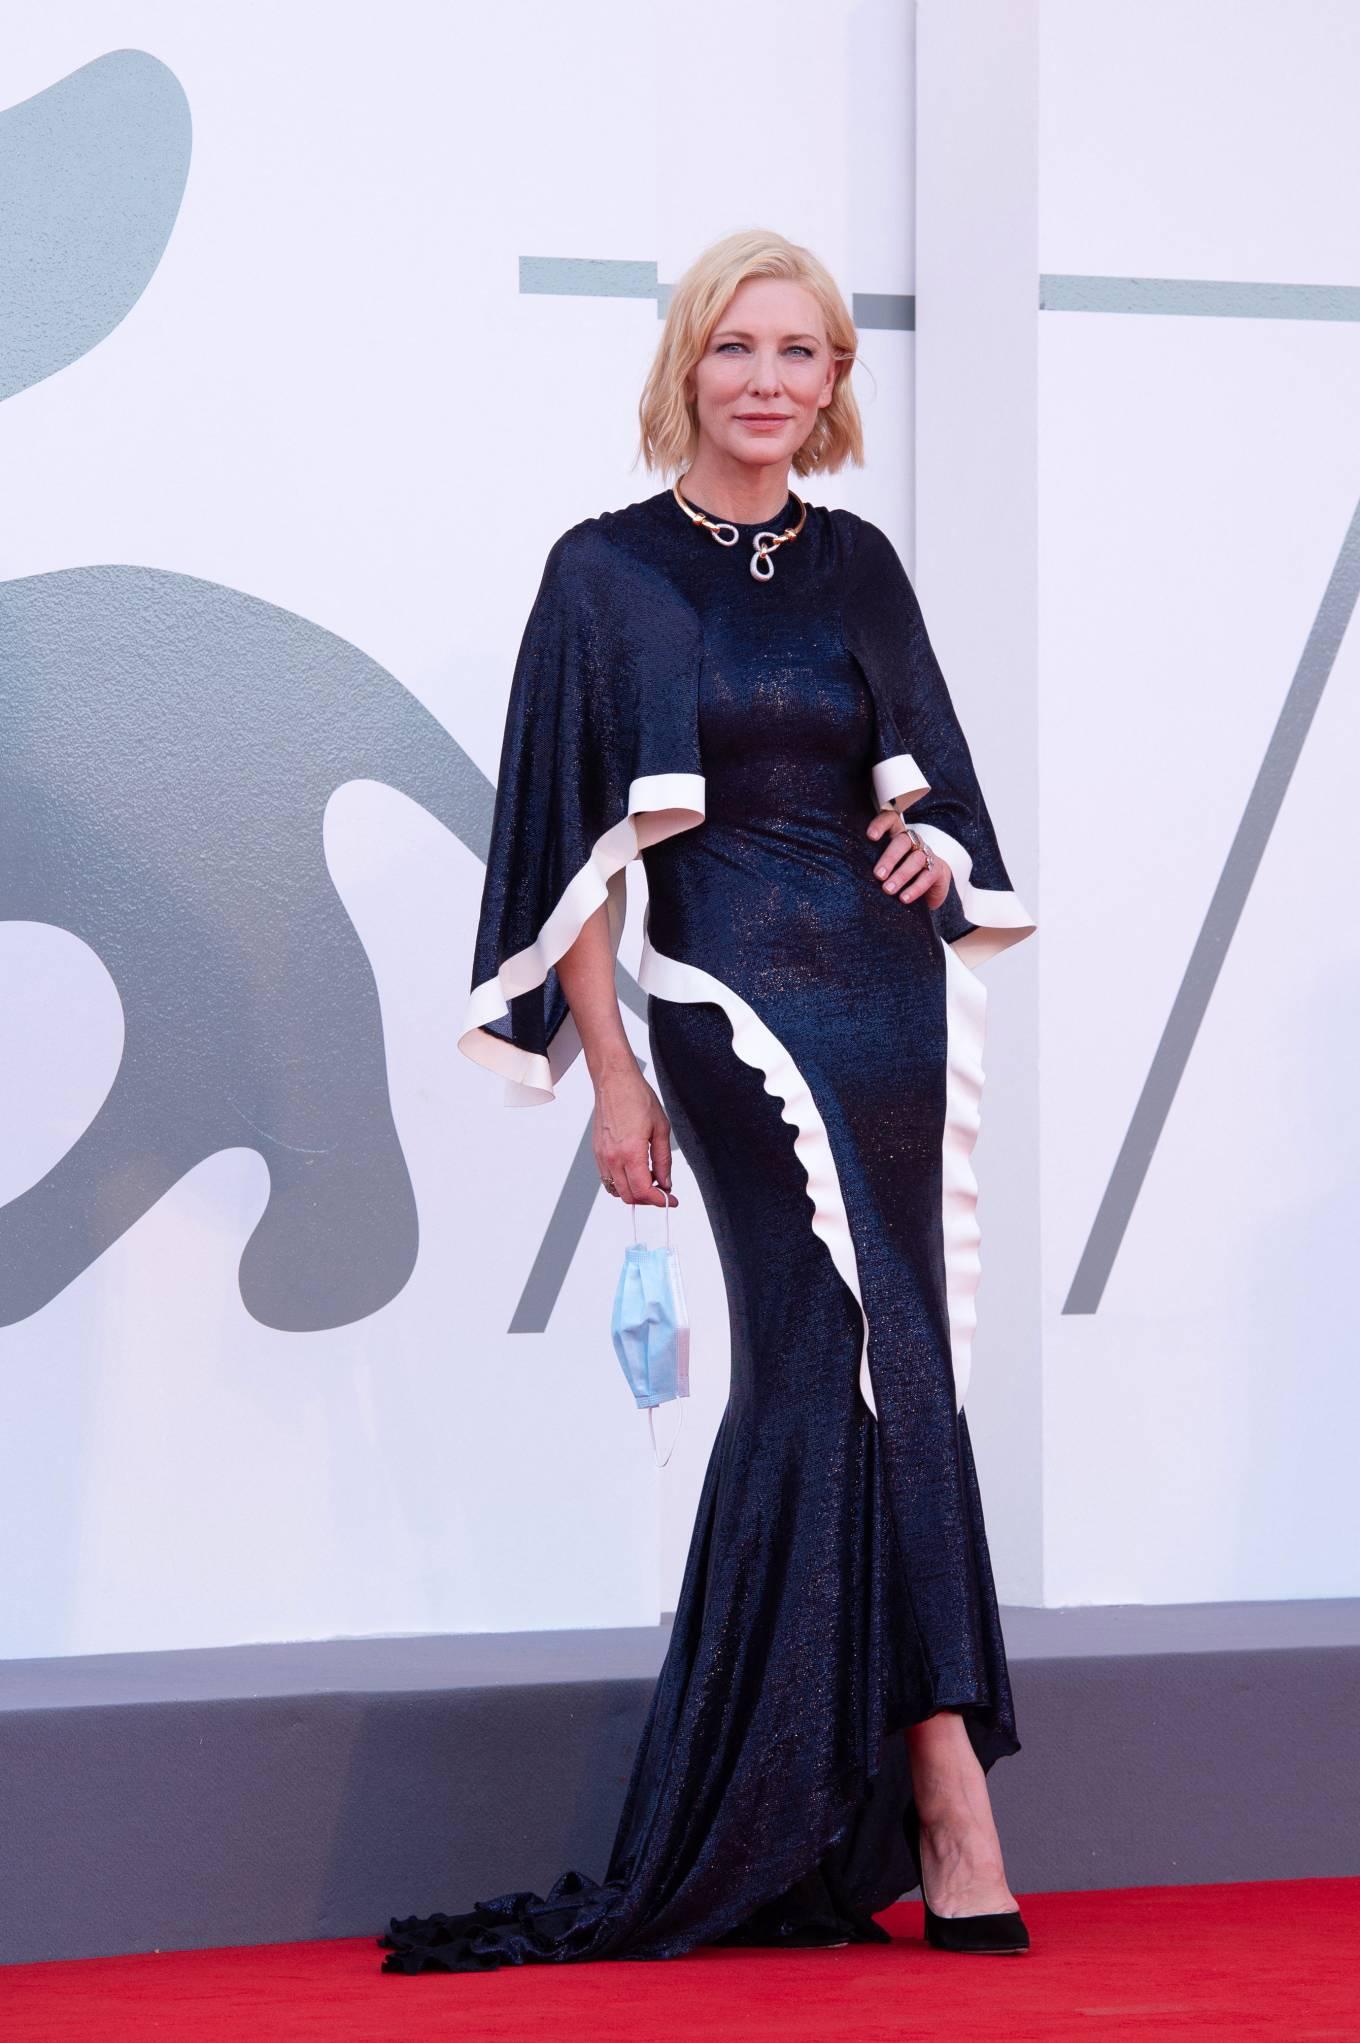 Cate Blanchett 2020 : Cate Blanchett attending Opening Ceremony at 2020 Venice International Film Festival – Italy-01